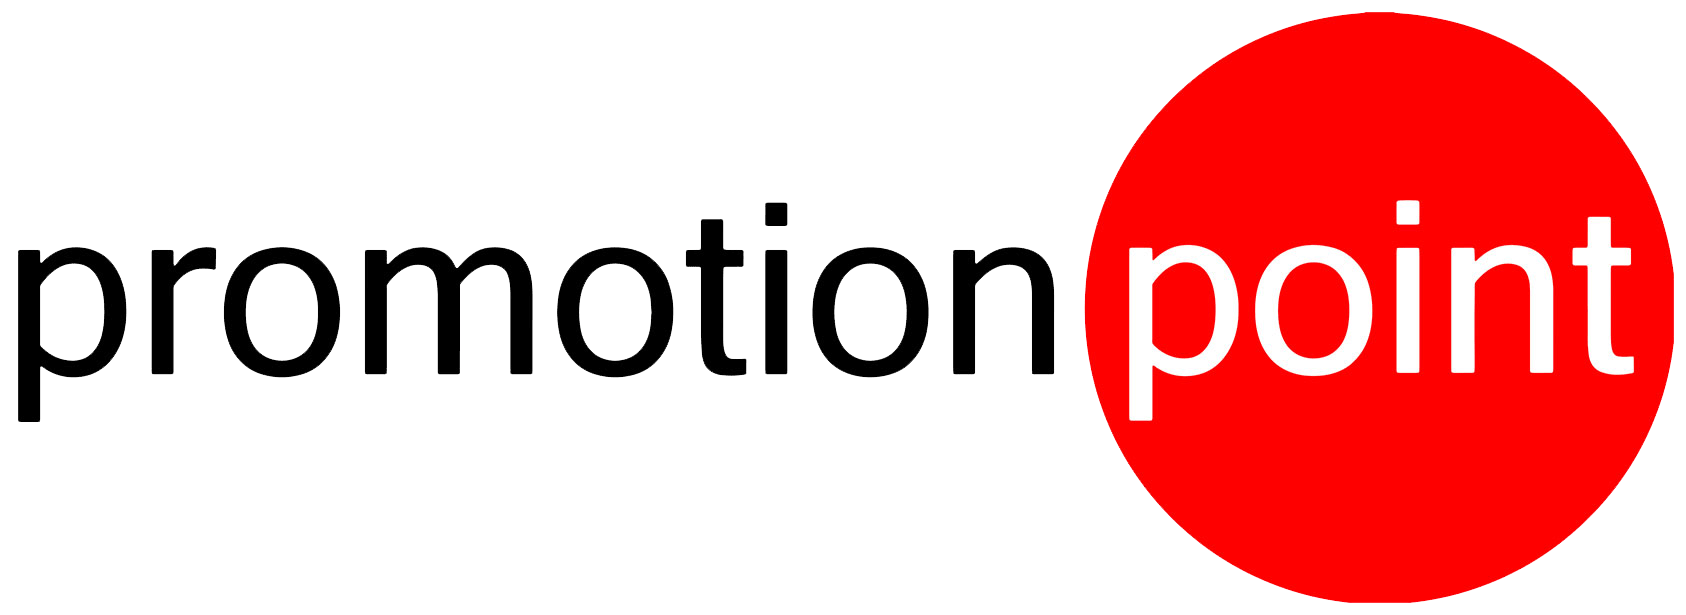 Promotion Point Oy logo